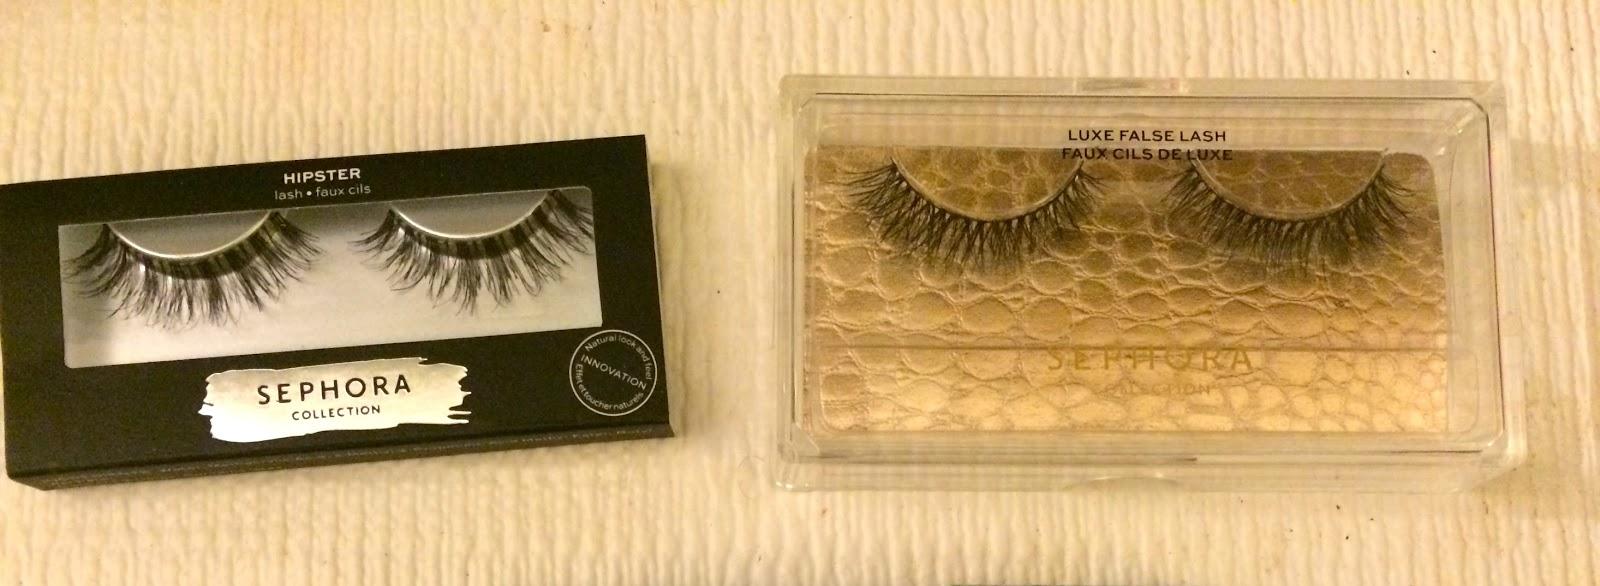 d99eccc37d2 Sephora Collection False Lashes in Hipster $10 (L), Sephora Collection Luxe  False Lash in Quill $17(R)